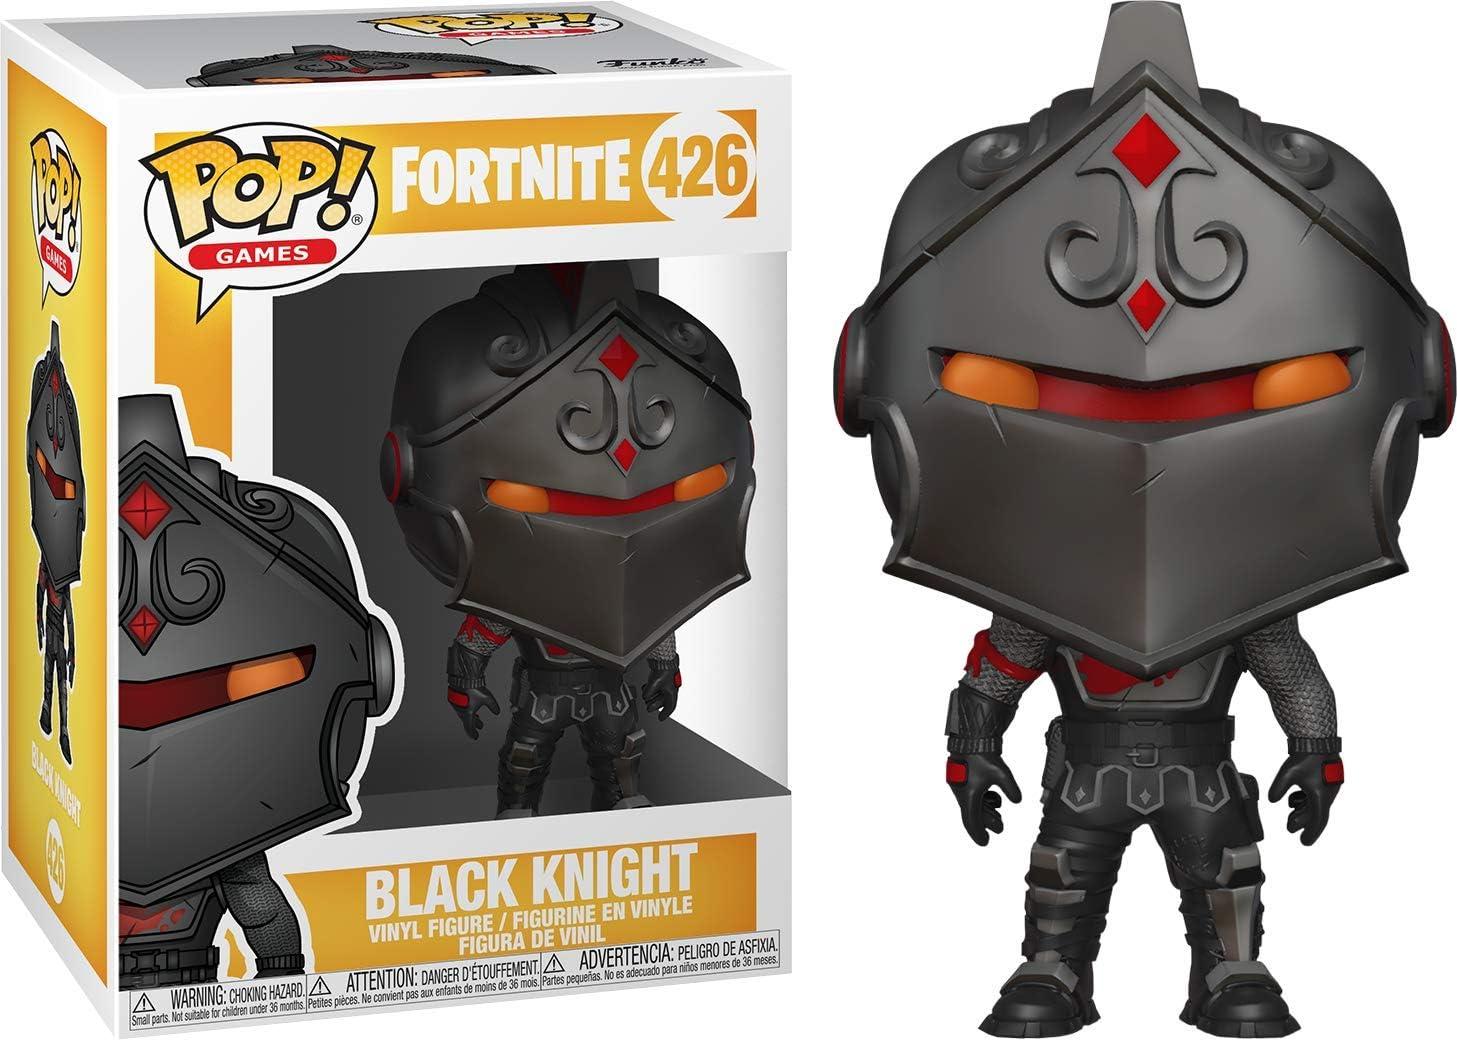 Funko Pop Games Fortnite Series 1 Black Knight Figurine